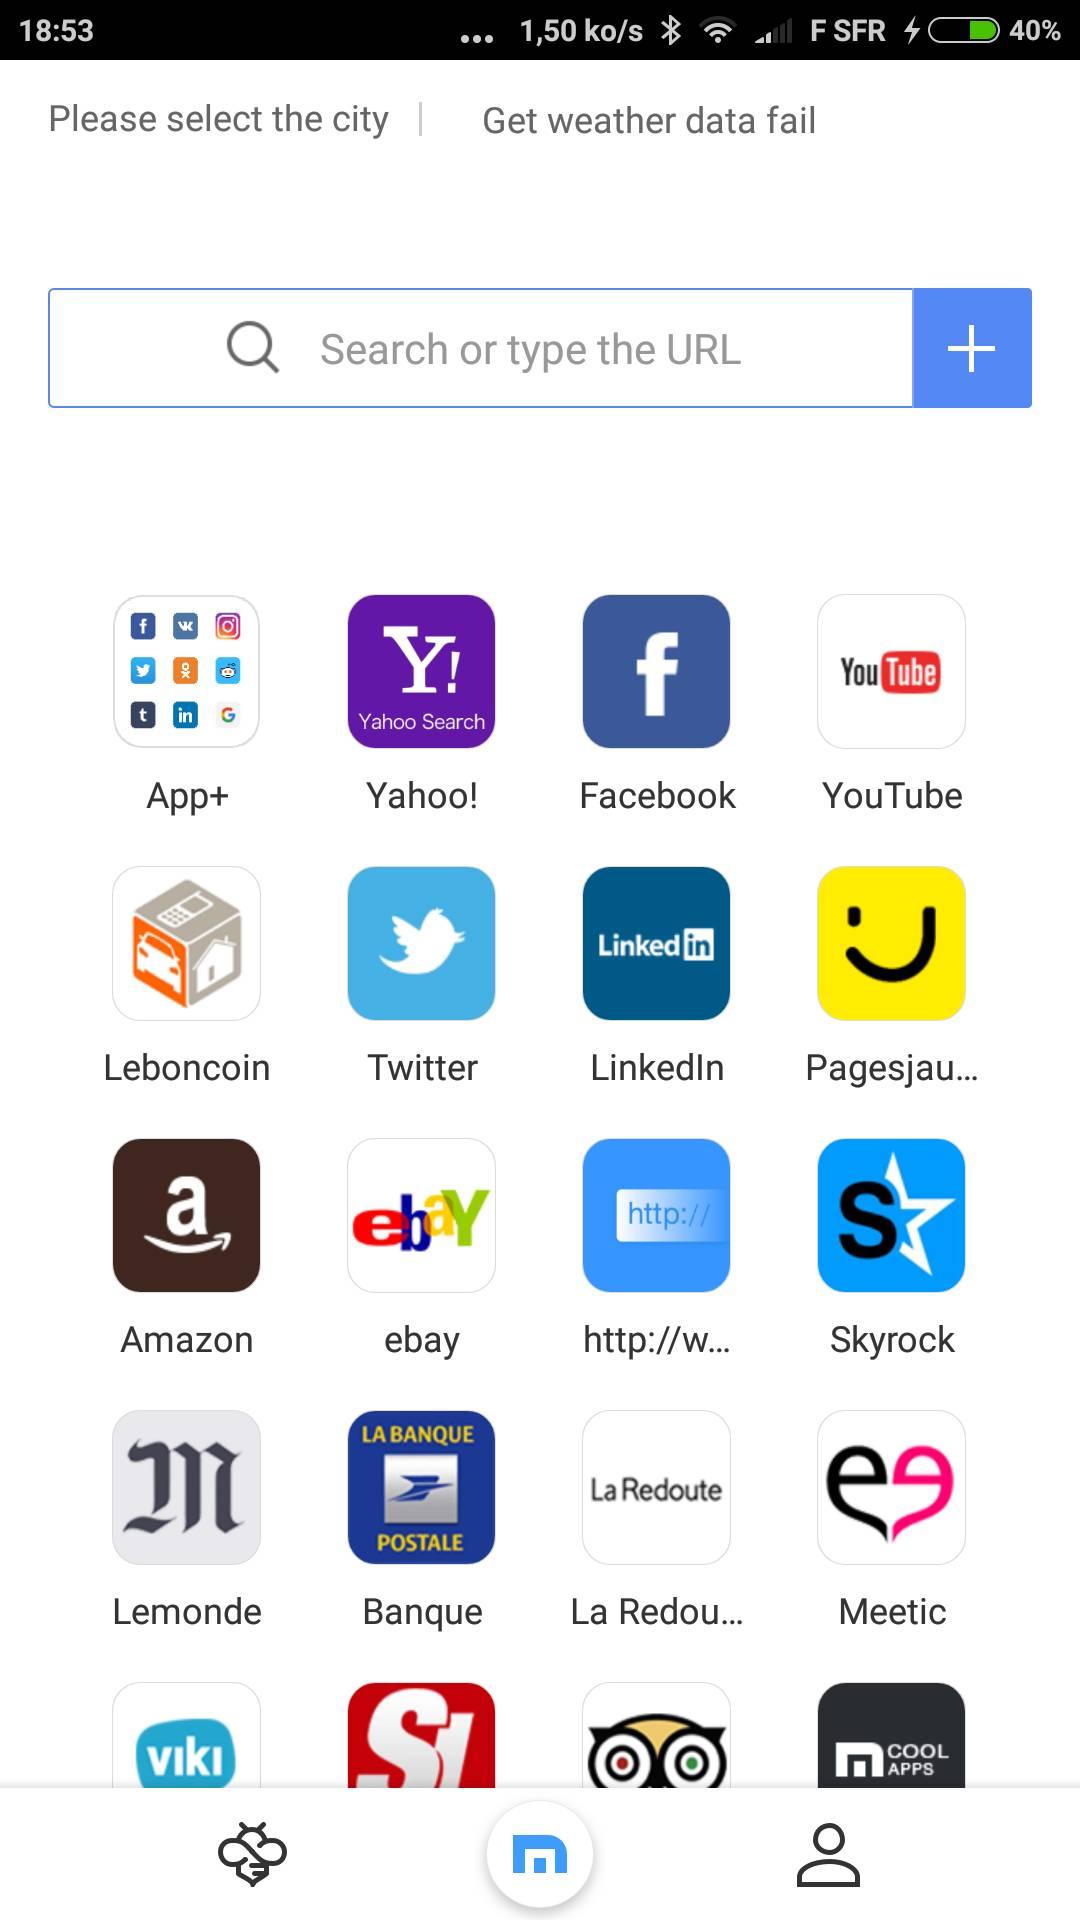 Redmi Note 2_ScreenShot_20170104_3.jpg